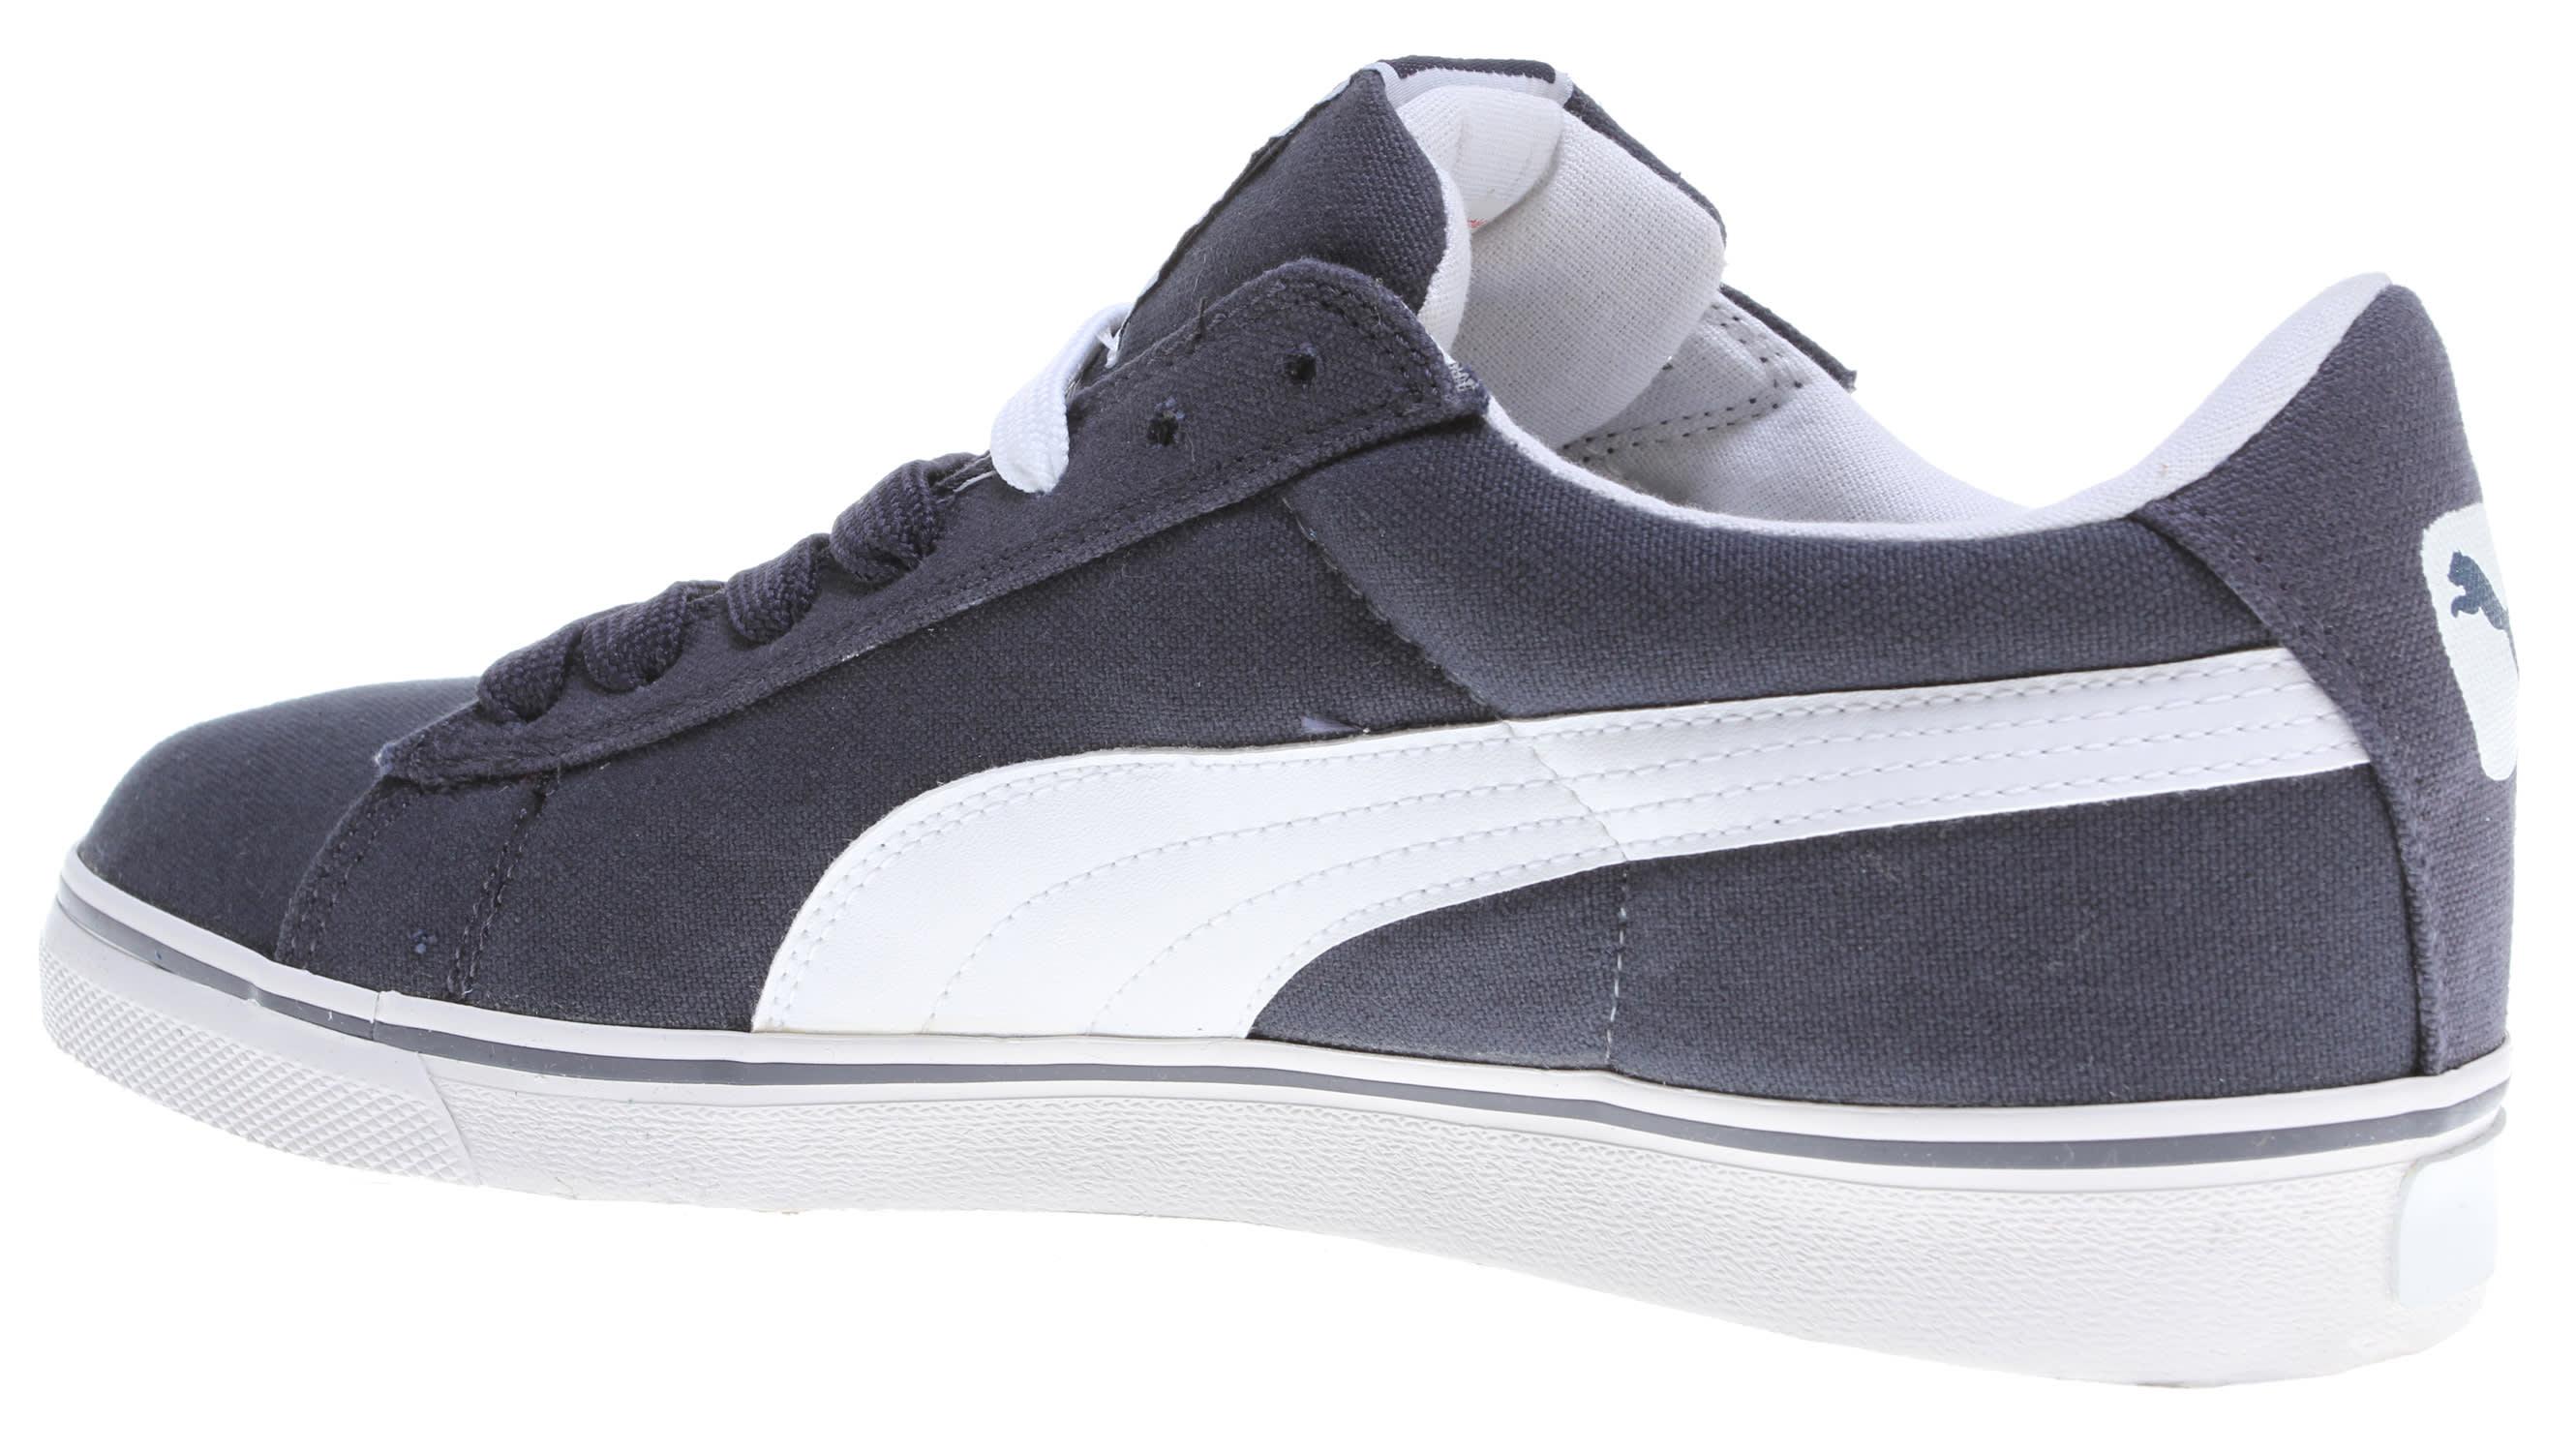 3c269c57b75 Puma Puma S Vulc Cvs Shoes - thumbnail 3